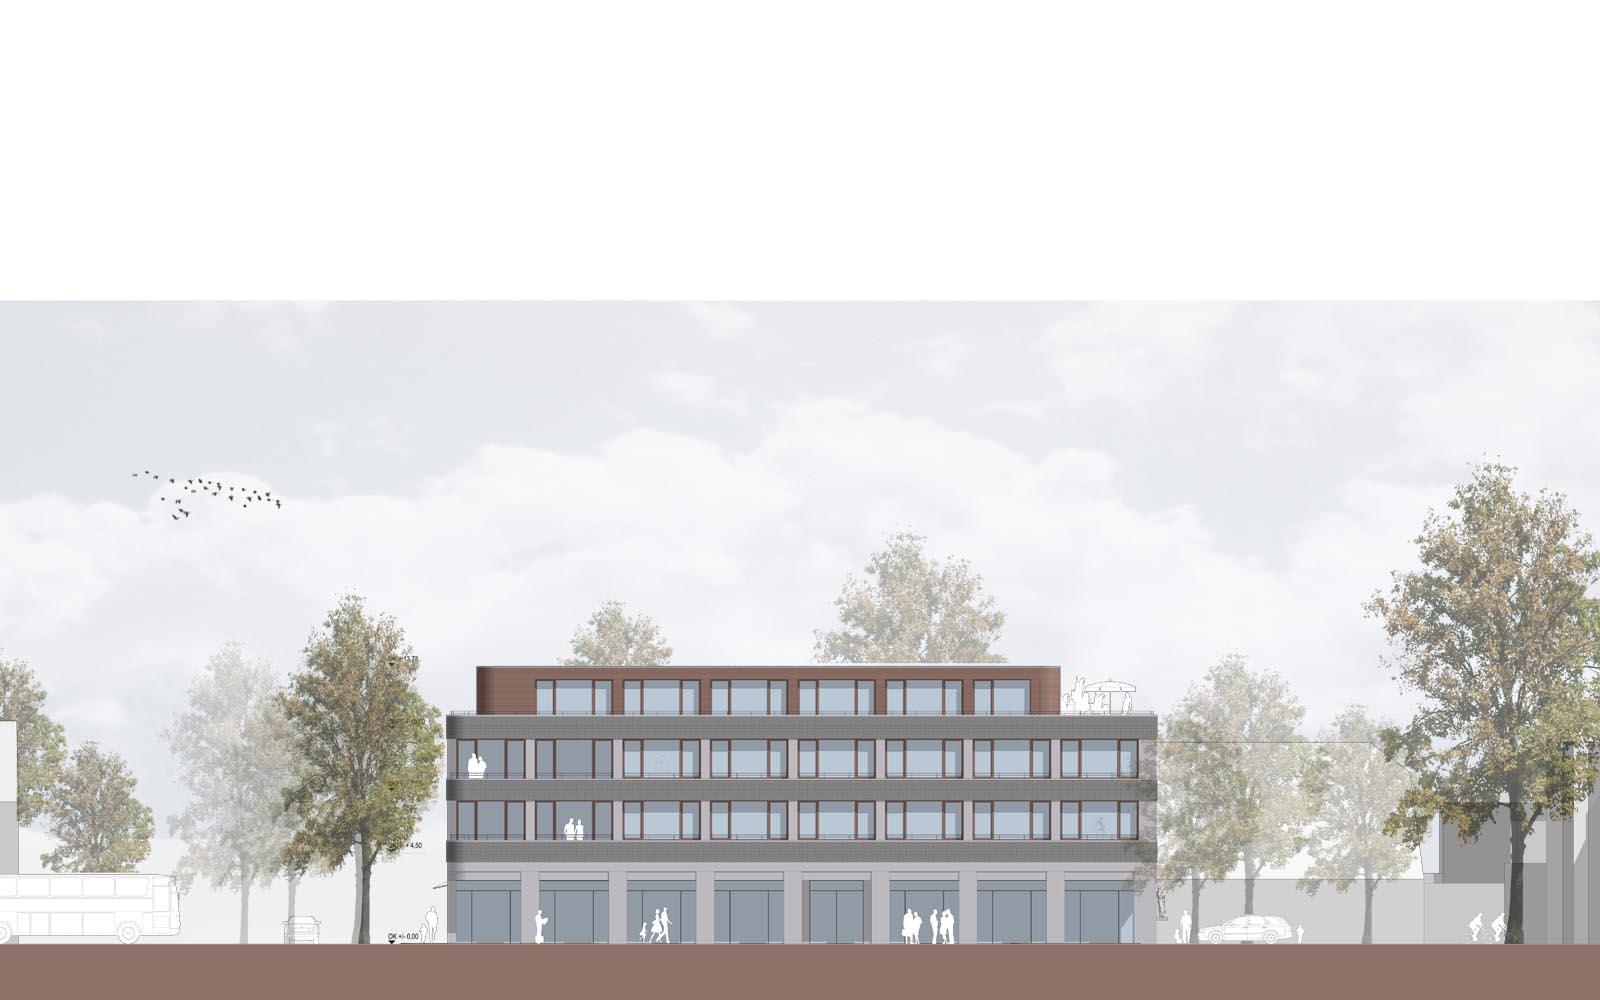 WBW_Meerbusch_SteinwegClausArchitekten_Mehrfamilienhaus_Geschäftshaus_Arkadengang_Staffelgeschoss_00006